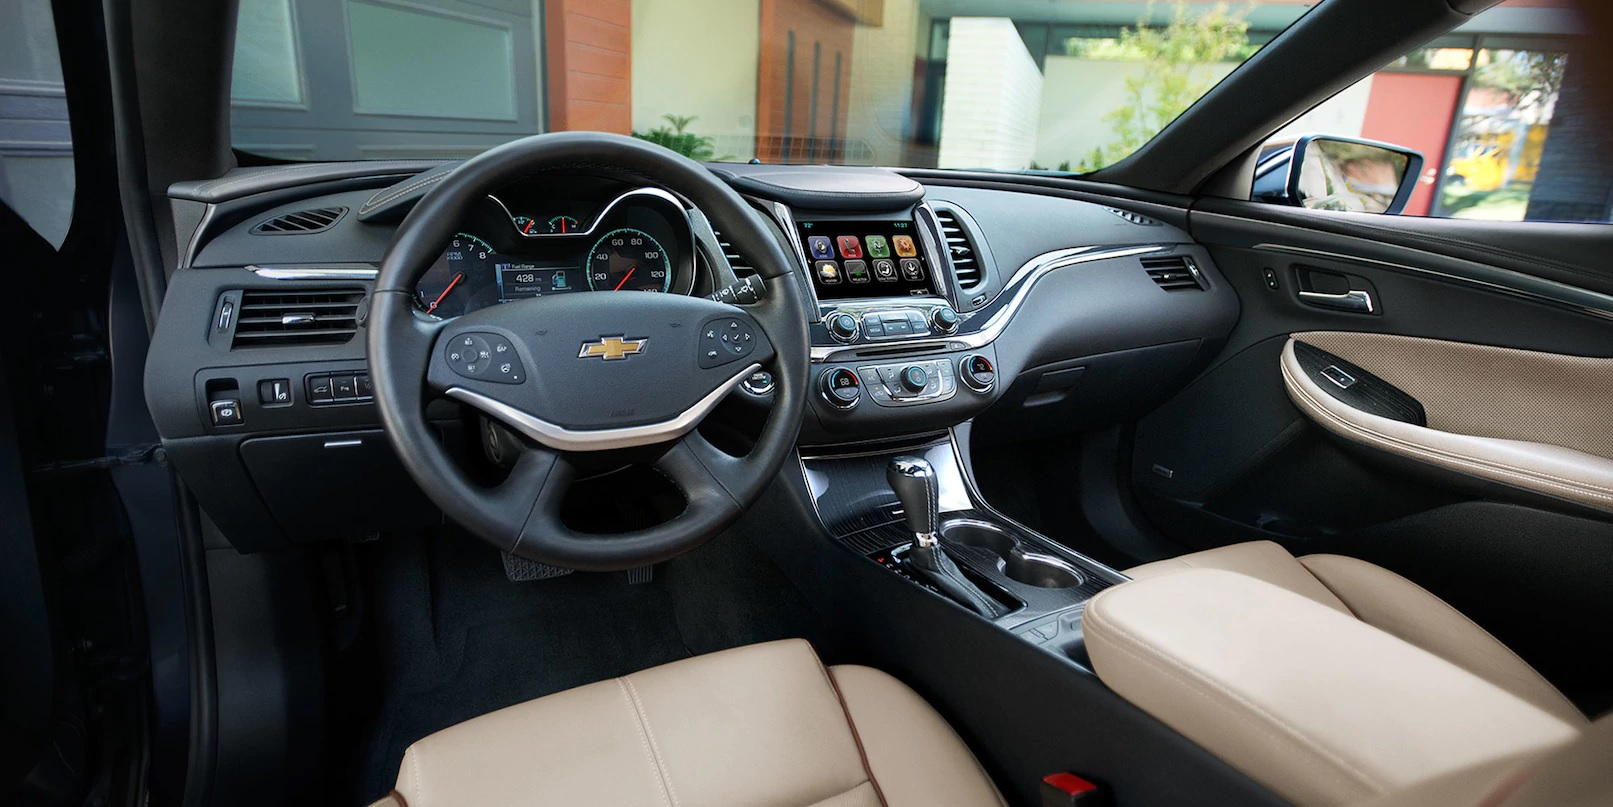 Interior of the 2018 Chevrolet Impala